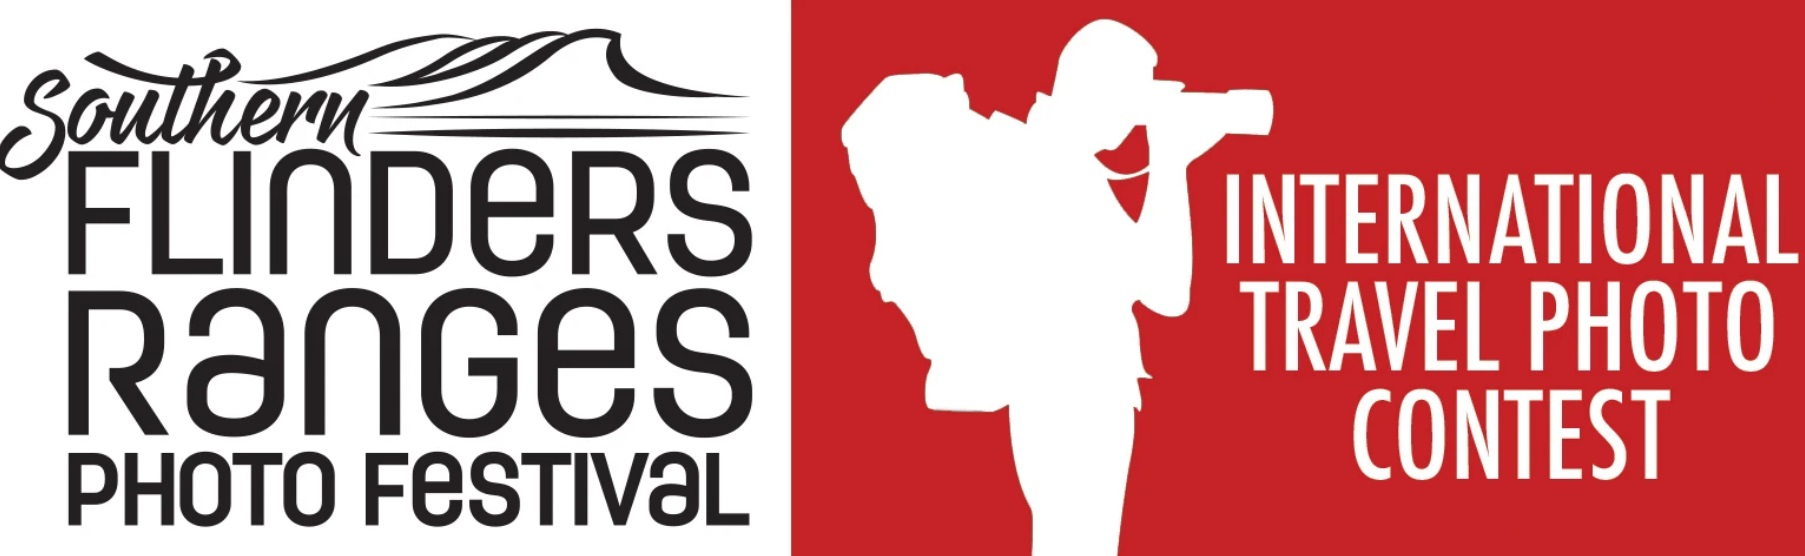 International Travel Photo Contest – Southern Flinders Ranges Photo Festival 2019 - logo